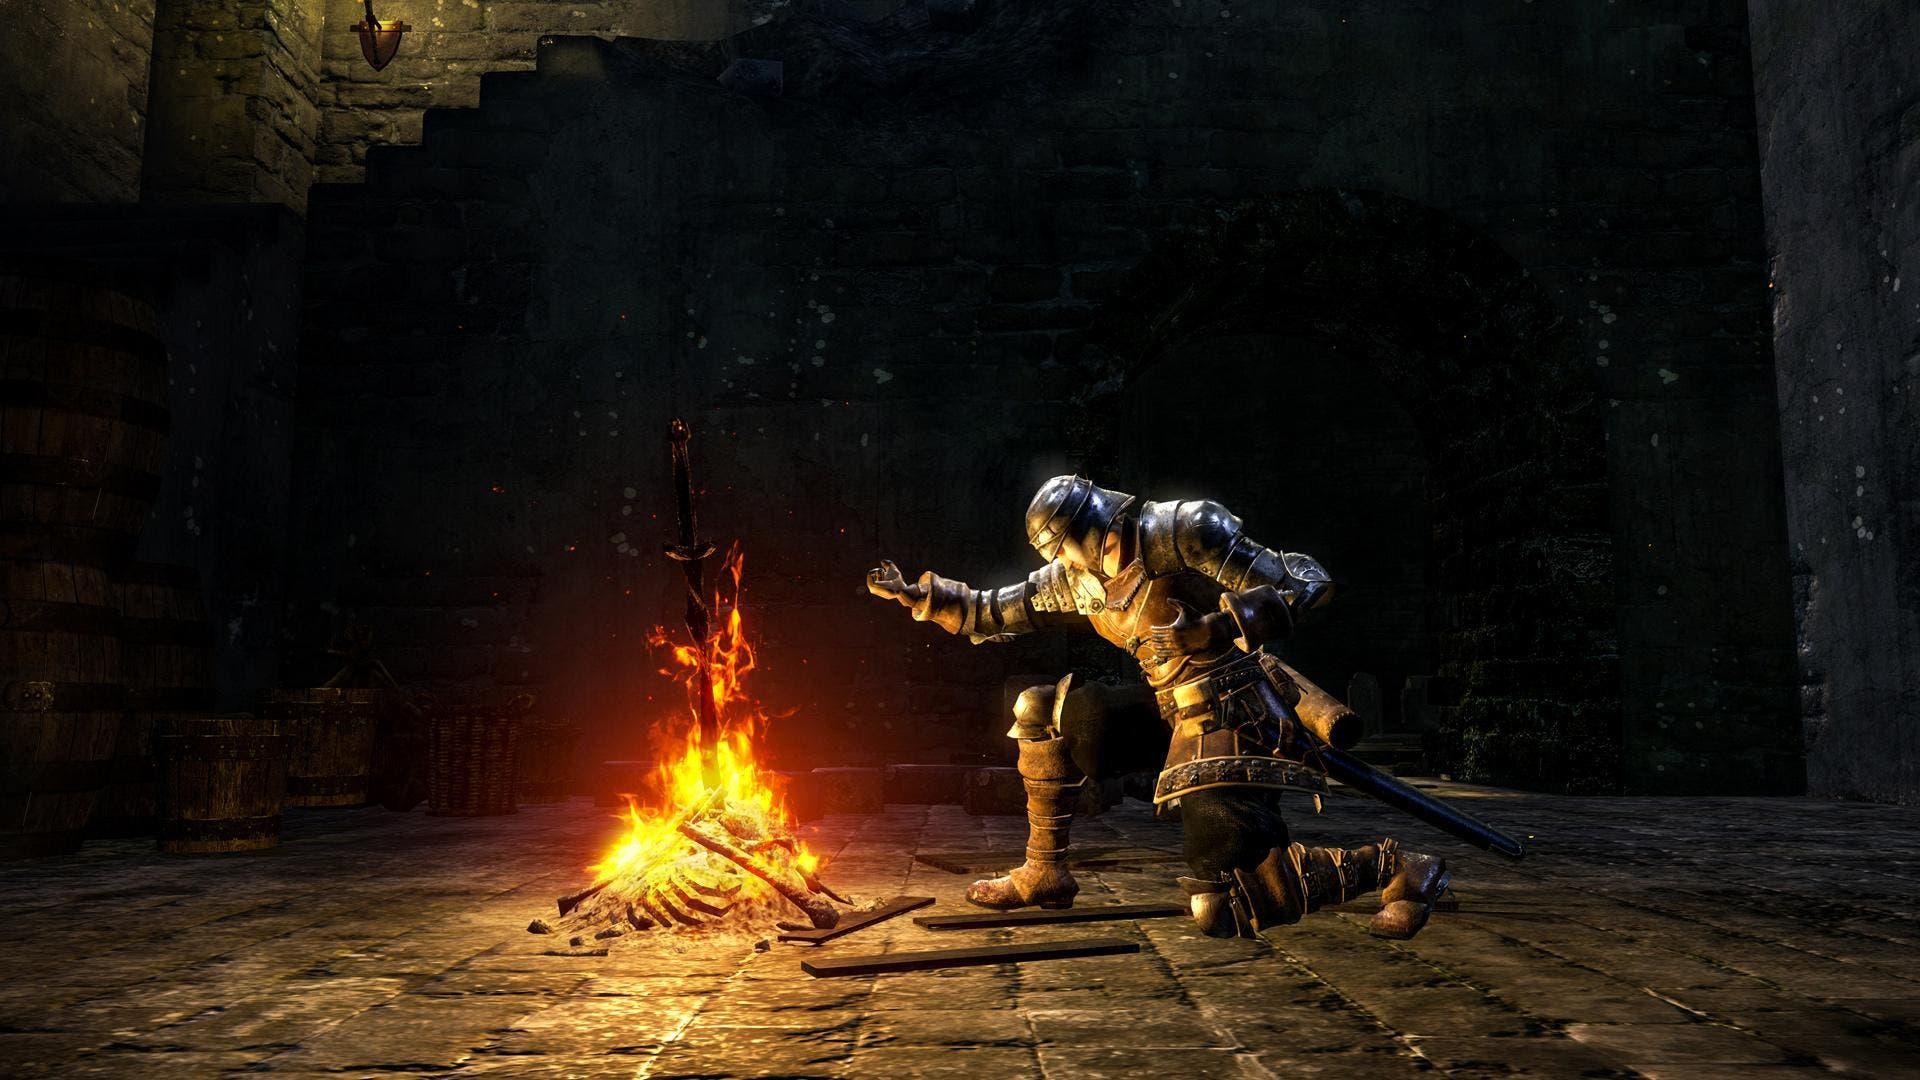 Análisis de Dark Souls: Remastered - Xbox One 1